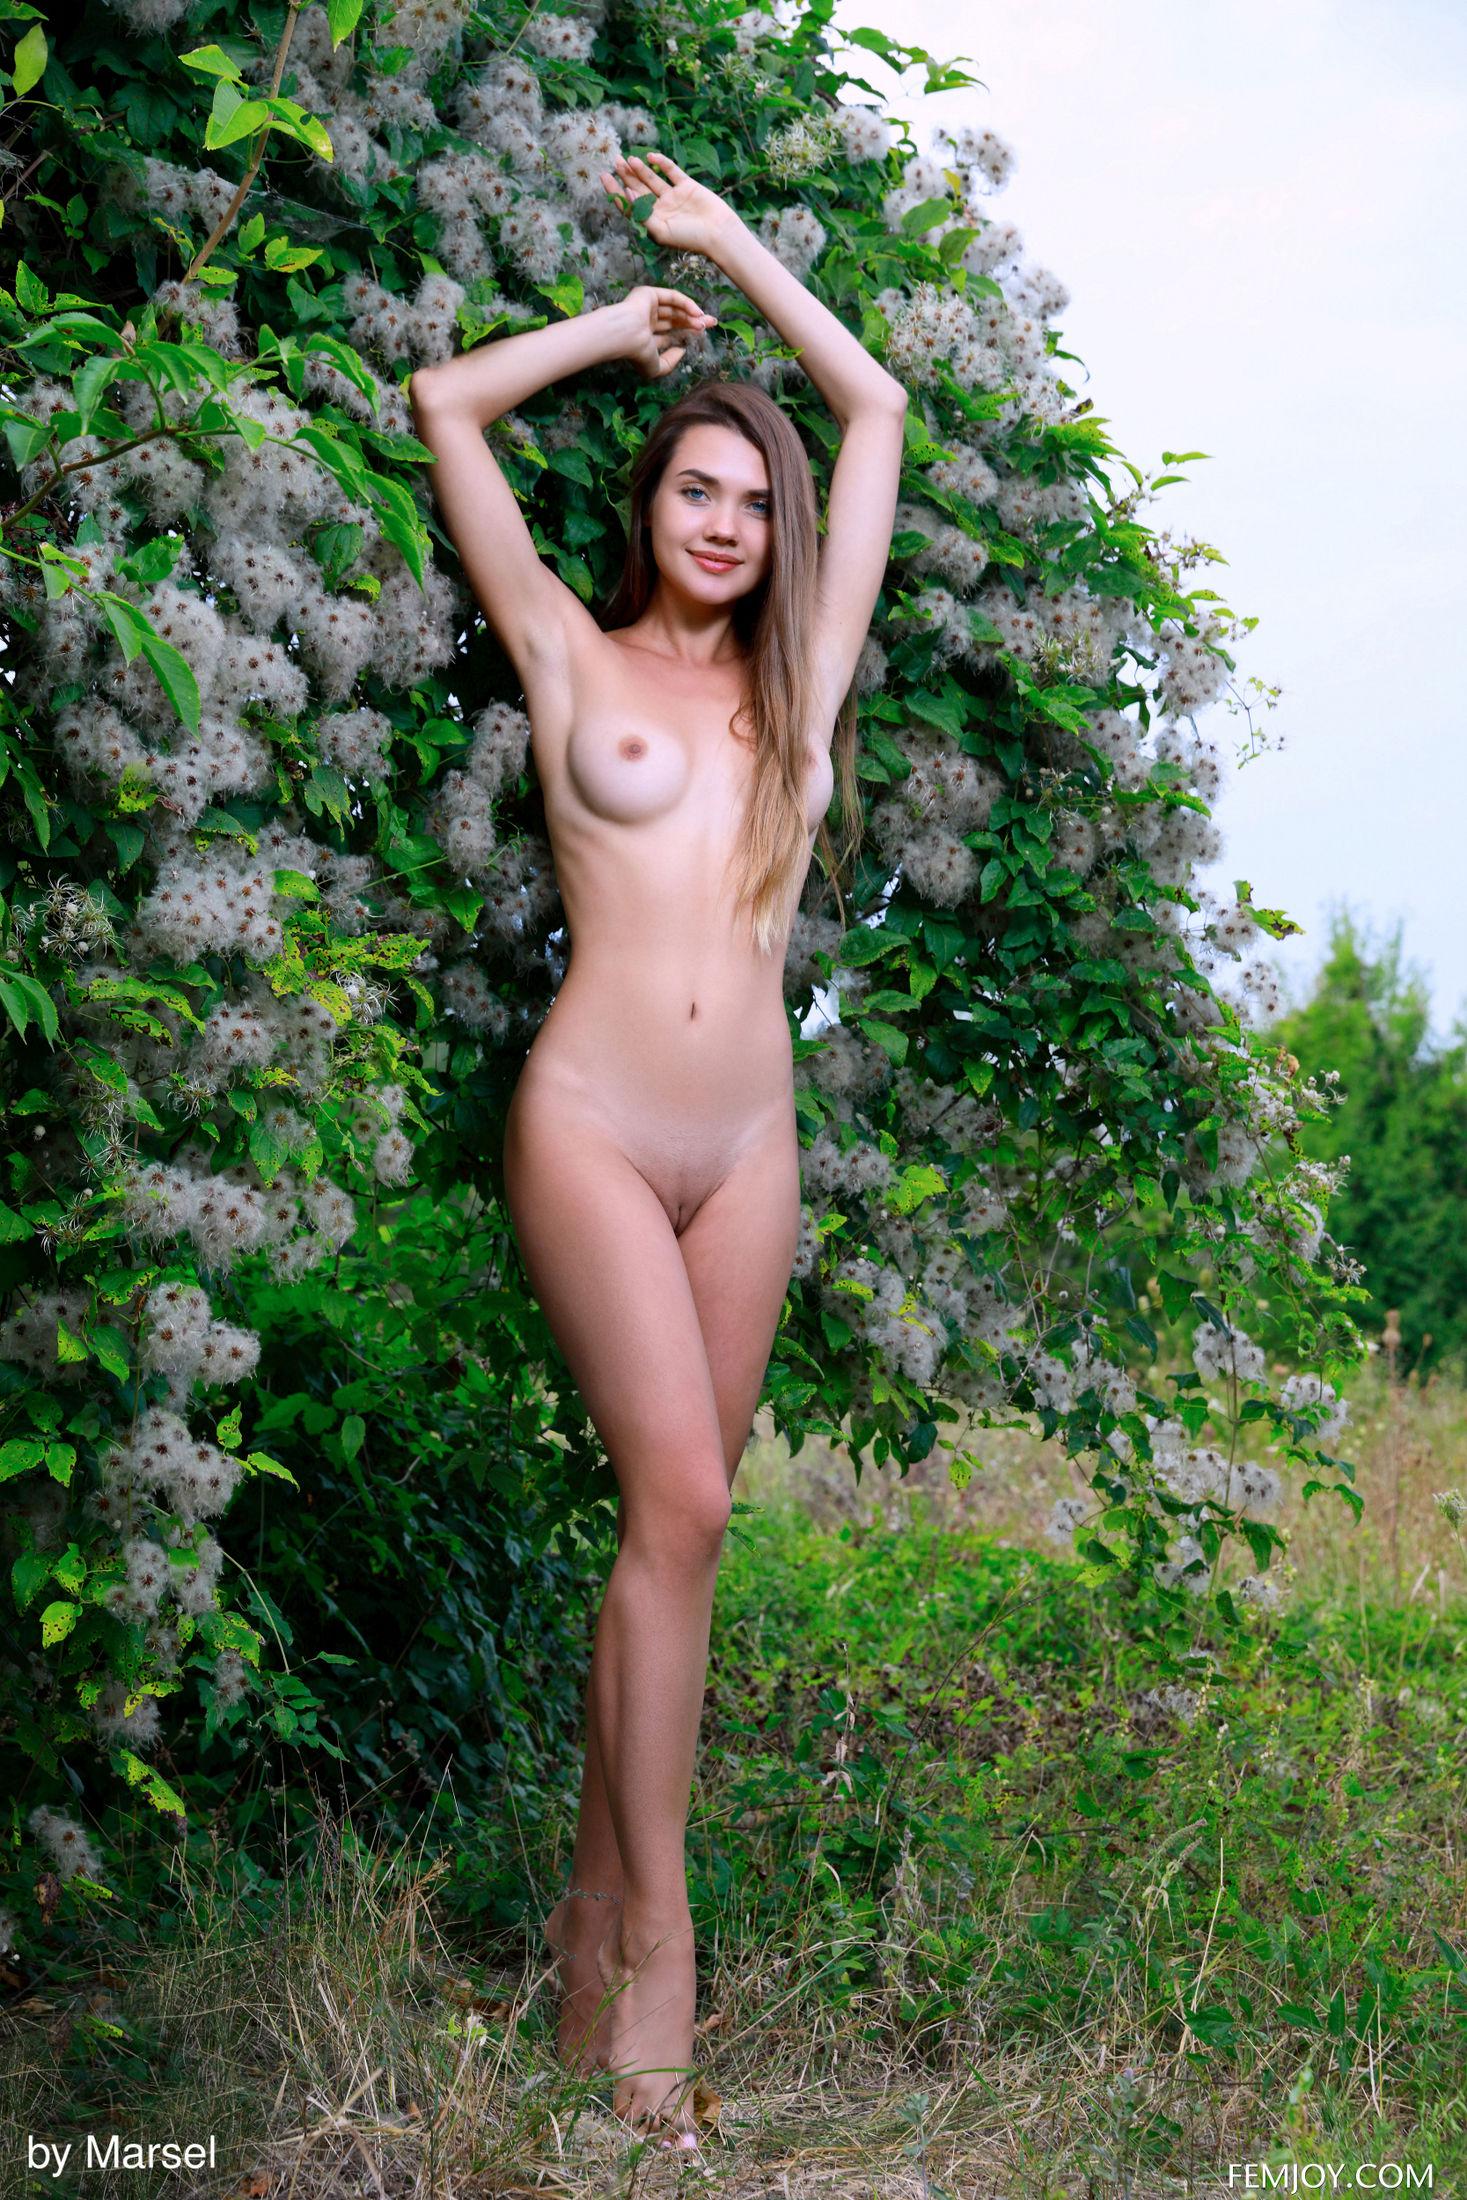 Susza - Bloom (Marsel photoshoot)